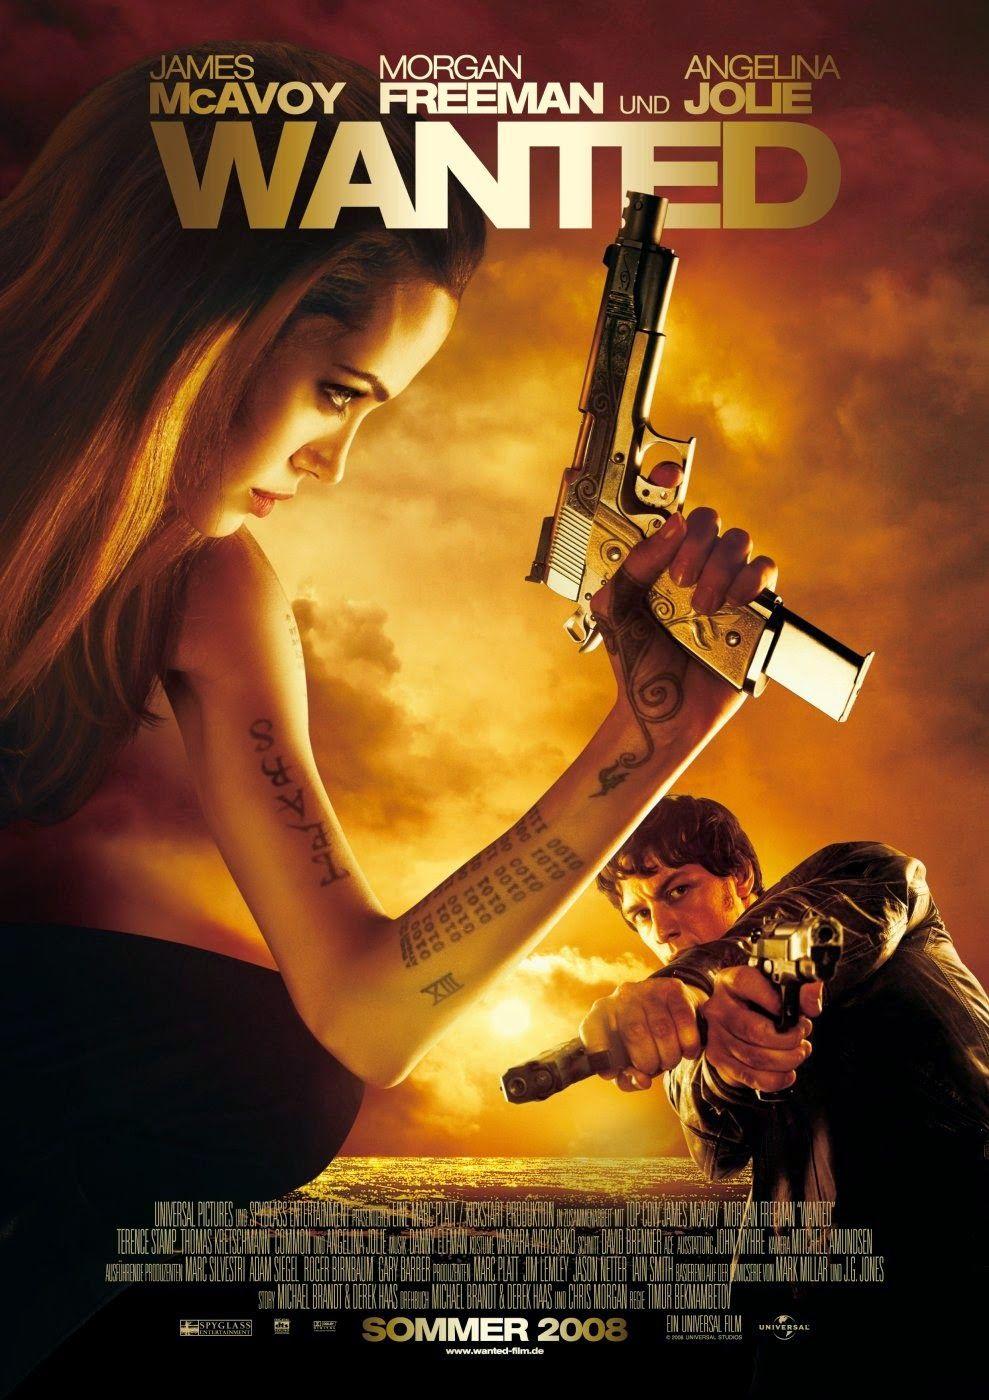 Wanted 2008 A Lifetime Of Bad Habits Filmes De Acao Dublado